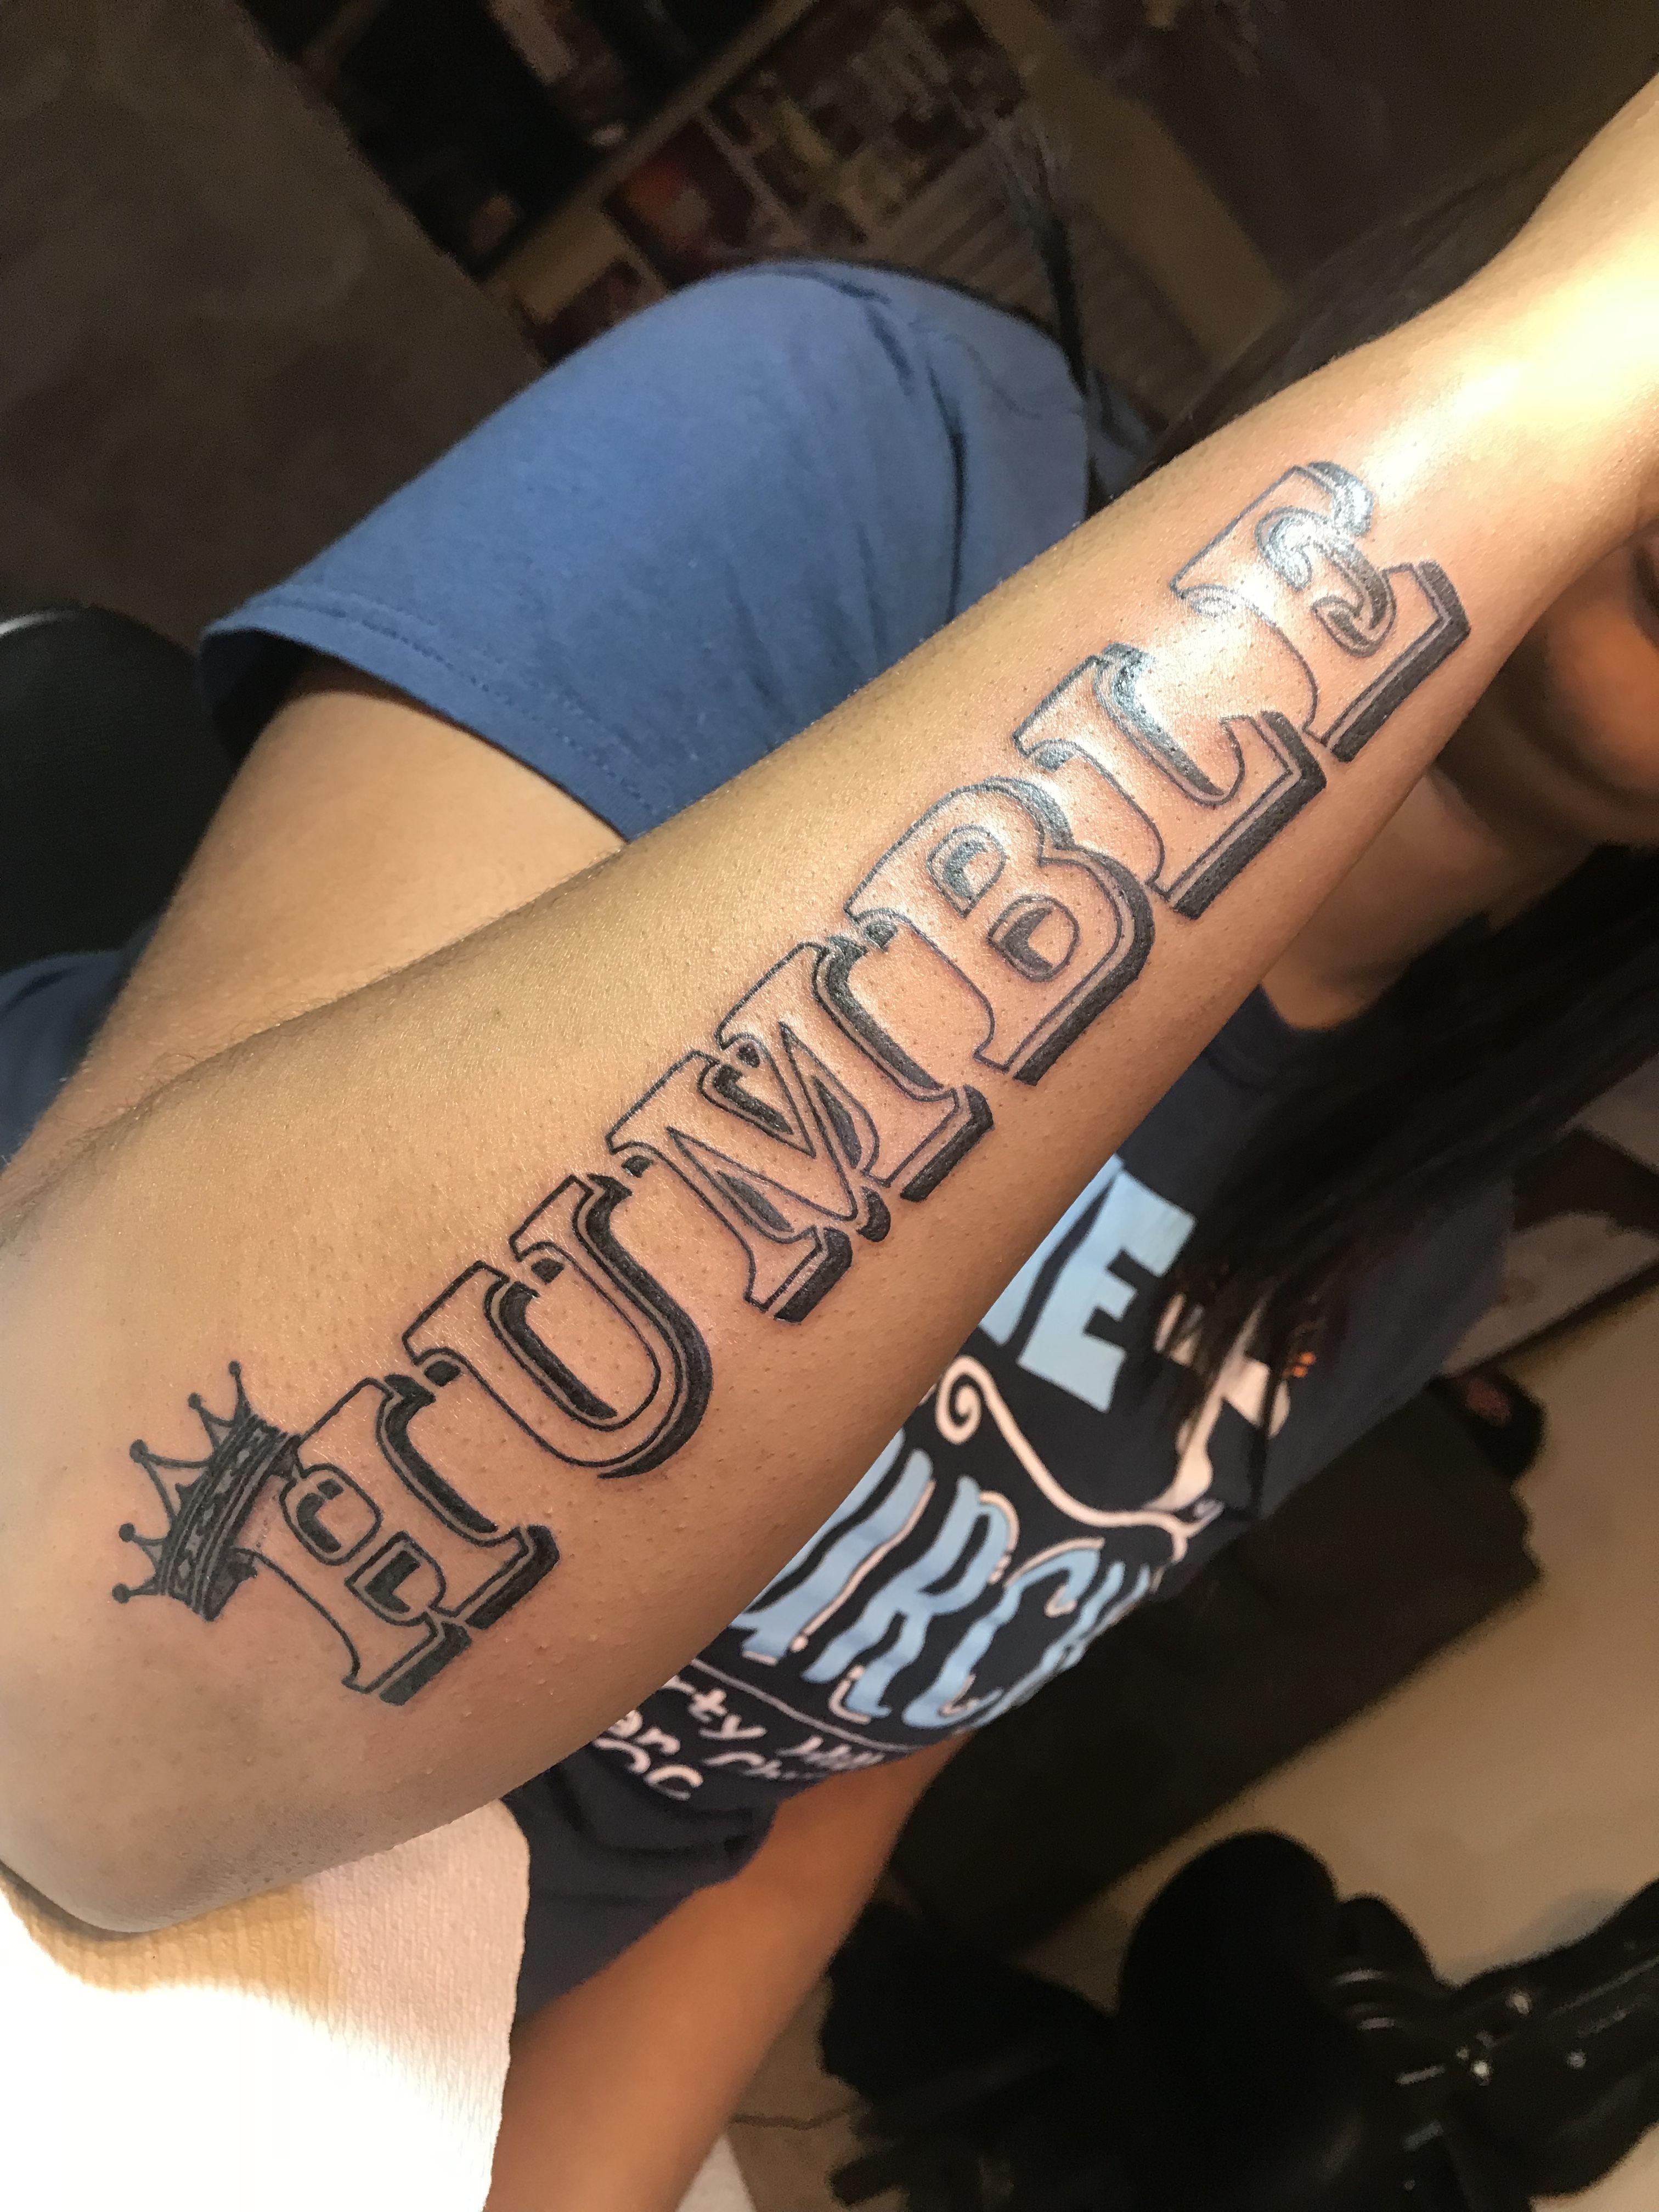 Humble Tattoo On Arm : humble, tattoo, ChubbInks, #AbzoluteInk, #Goodie803, #IveryJames, #Humble, #BusinessPartners, #BlackBusinesses, #Carolinas, #rapartist, #in…, Tattoos,, Rihanna, Tattoo,, Stylist, Tattoos